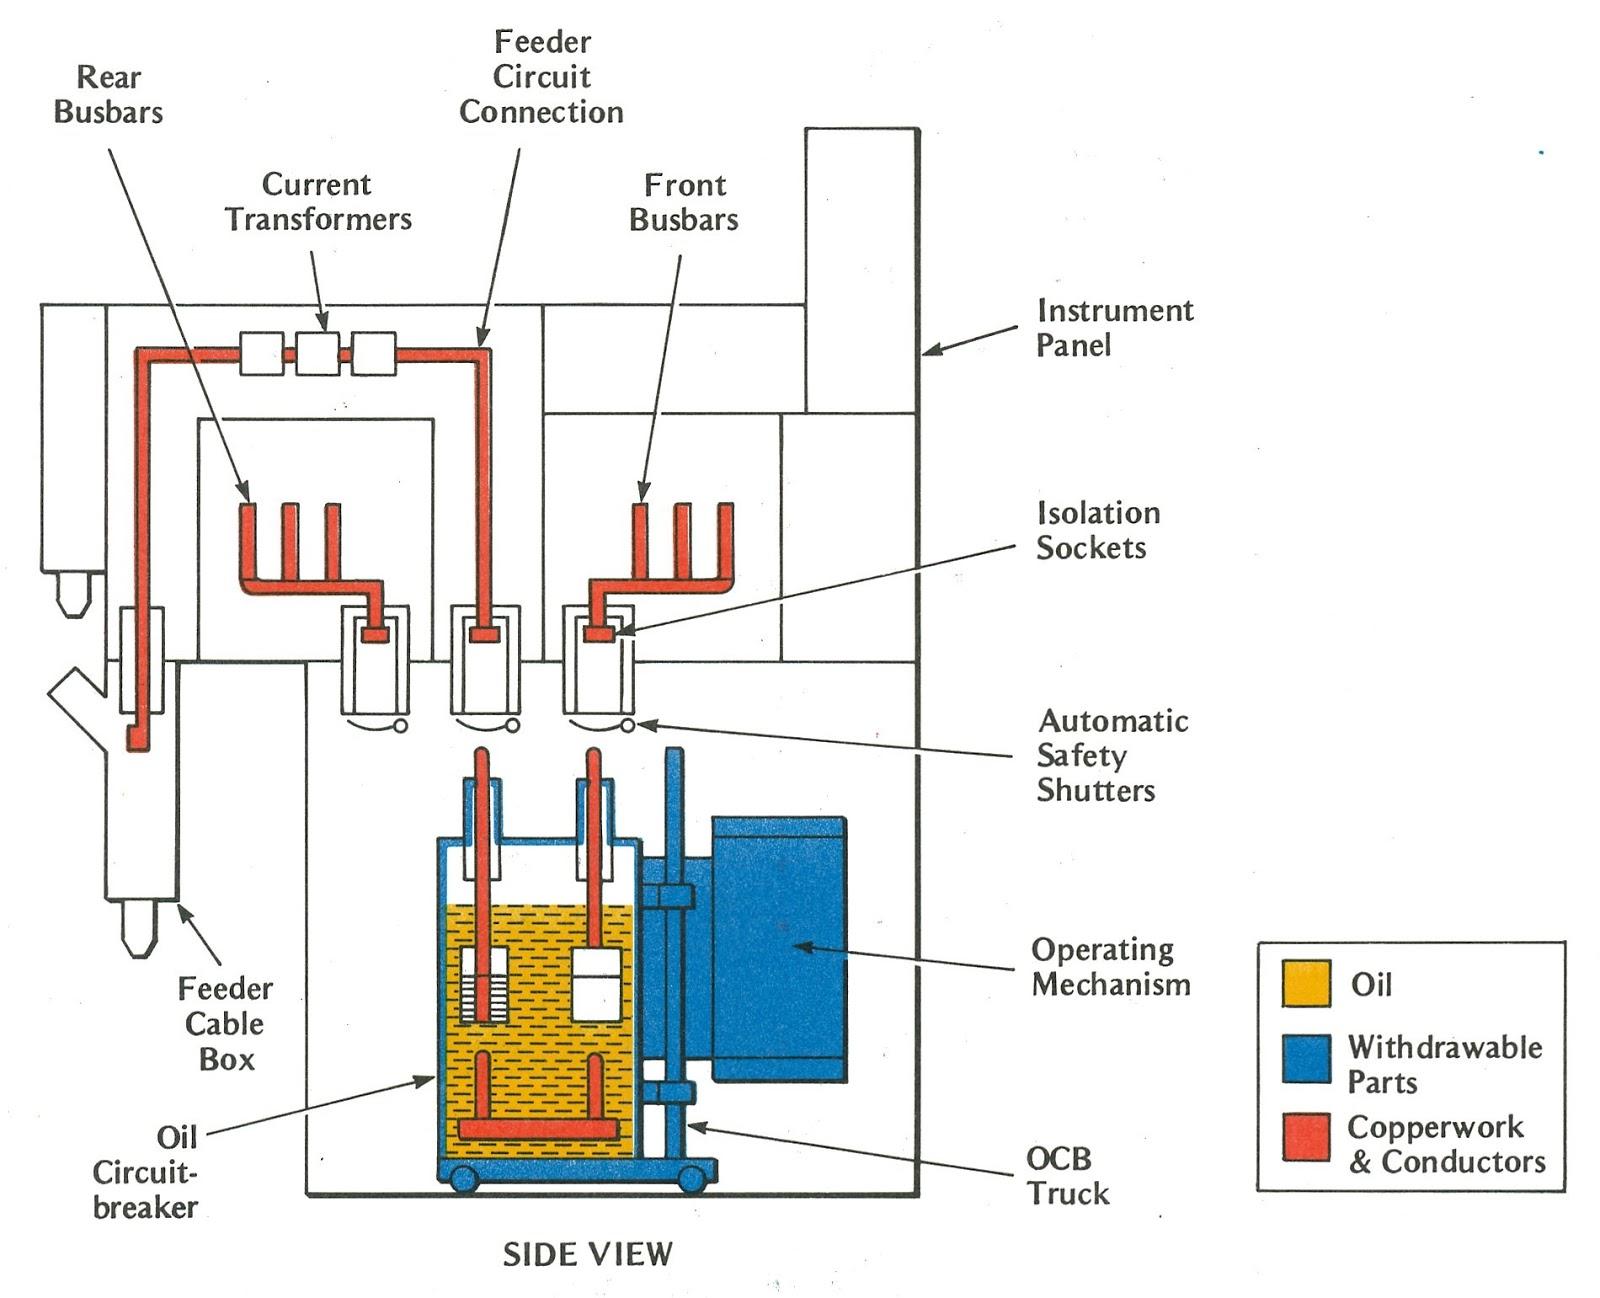 hight resolution of high voltage switchgear wiring diagram wiring diagram yer wiring diagram high voltage switch gear